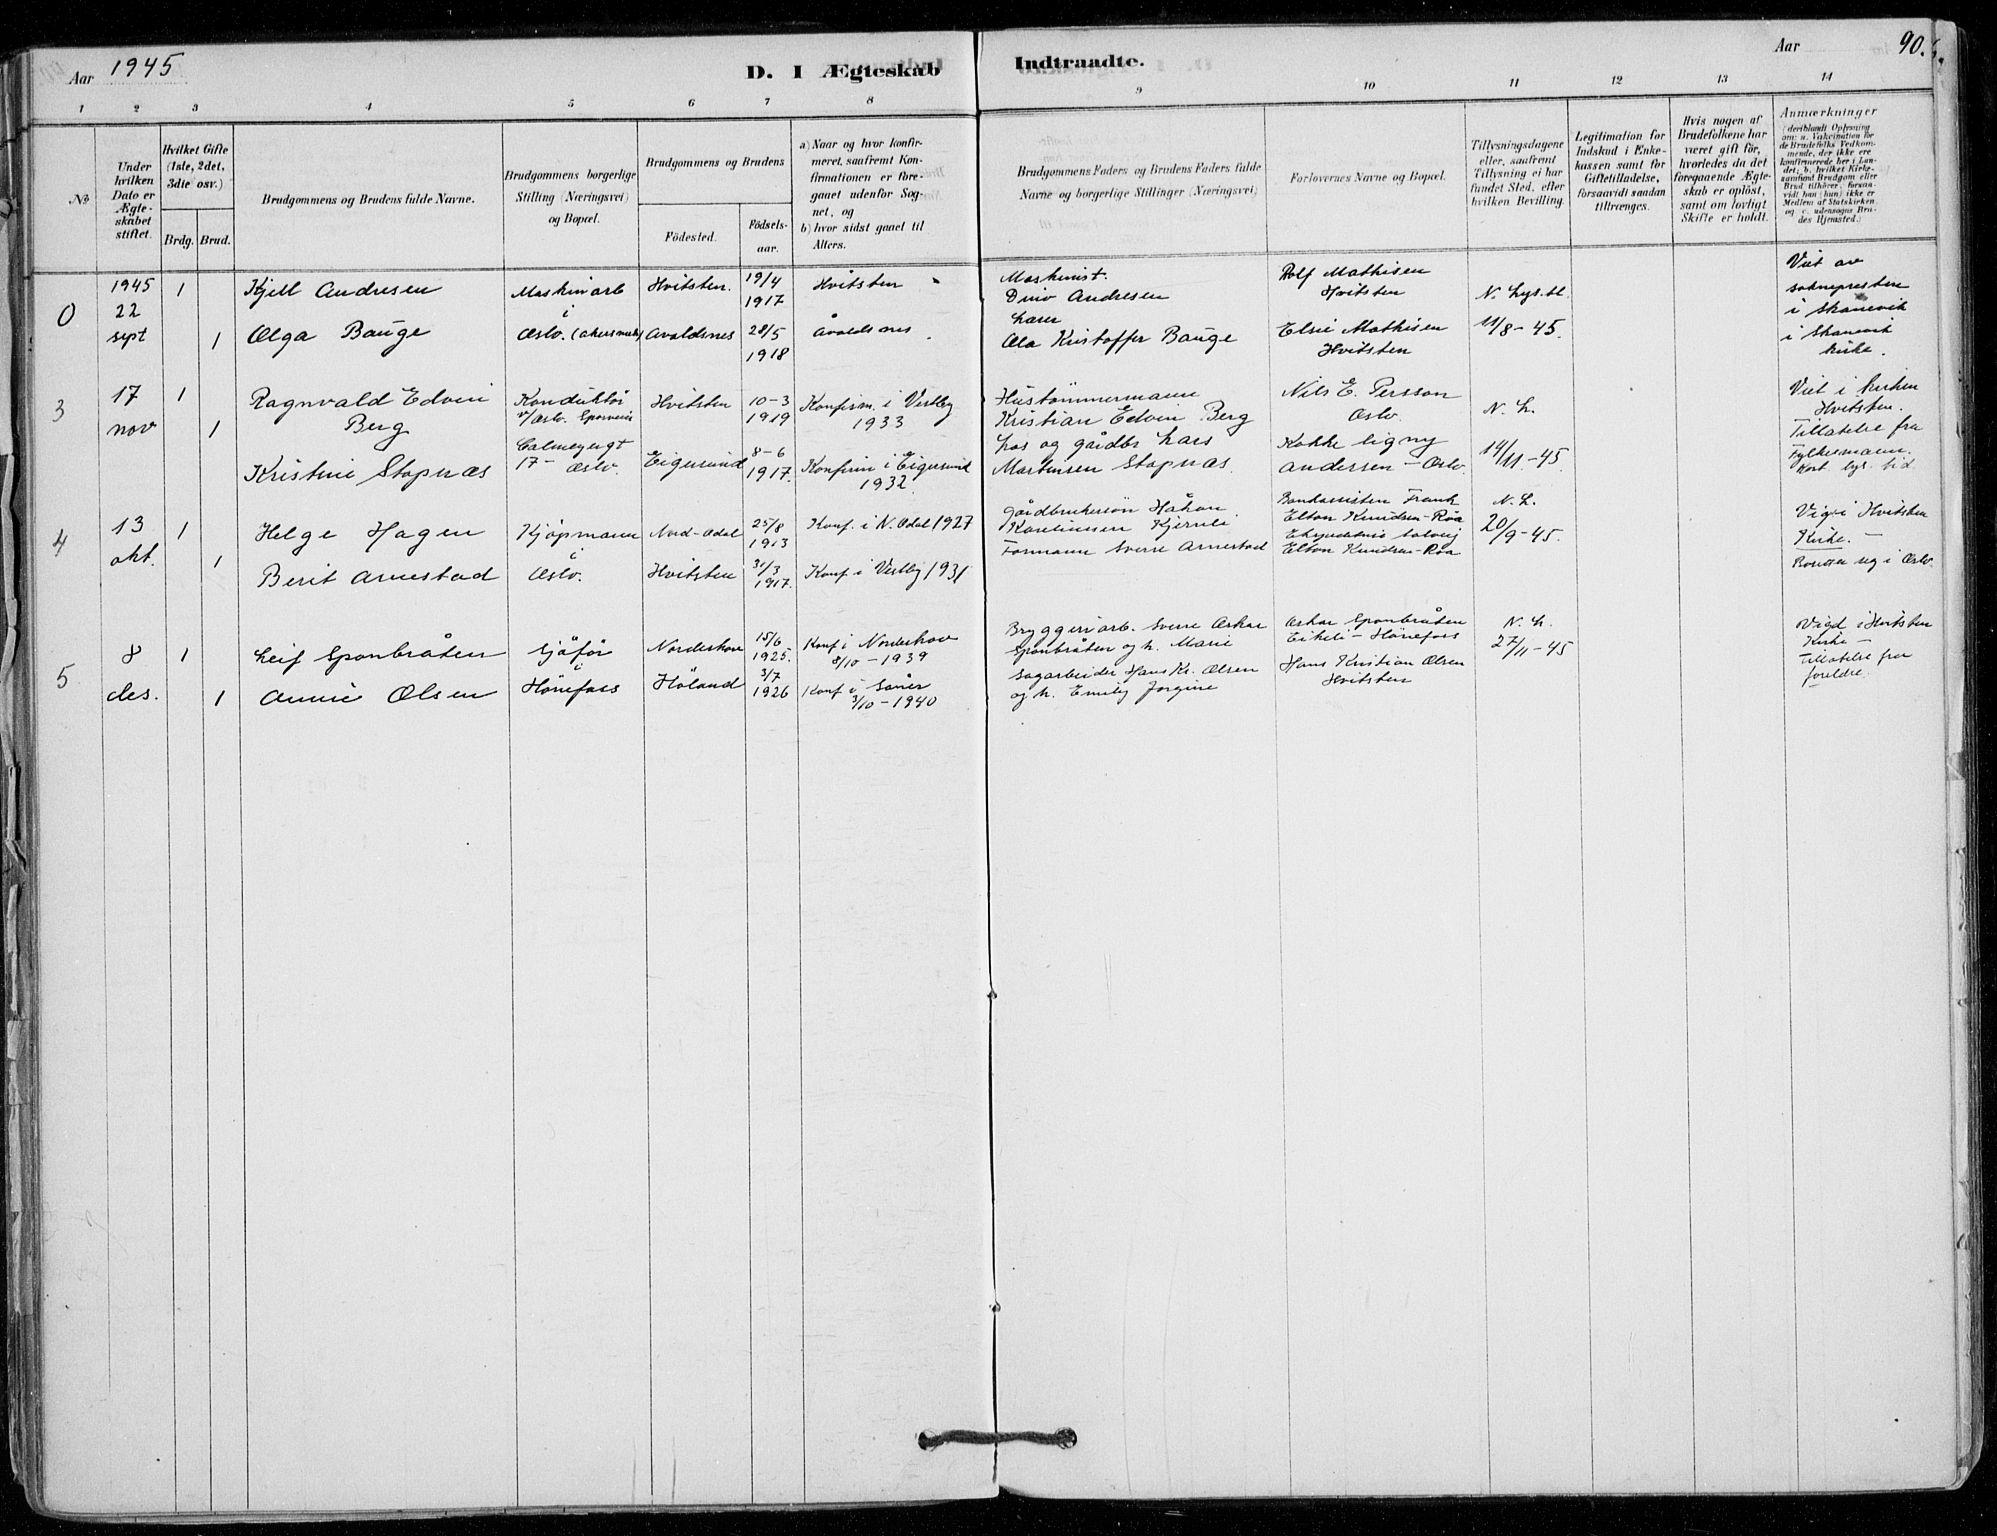 SAO, Vestby prestekontor Kirkebøker, F/Fd/L0001: Ministerialbok nr. IV 1, 1878-1945, s. 90